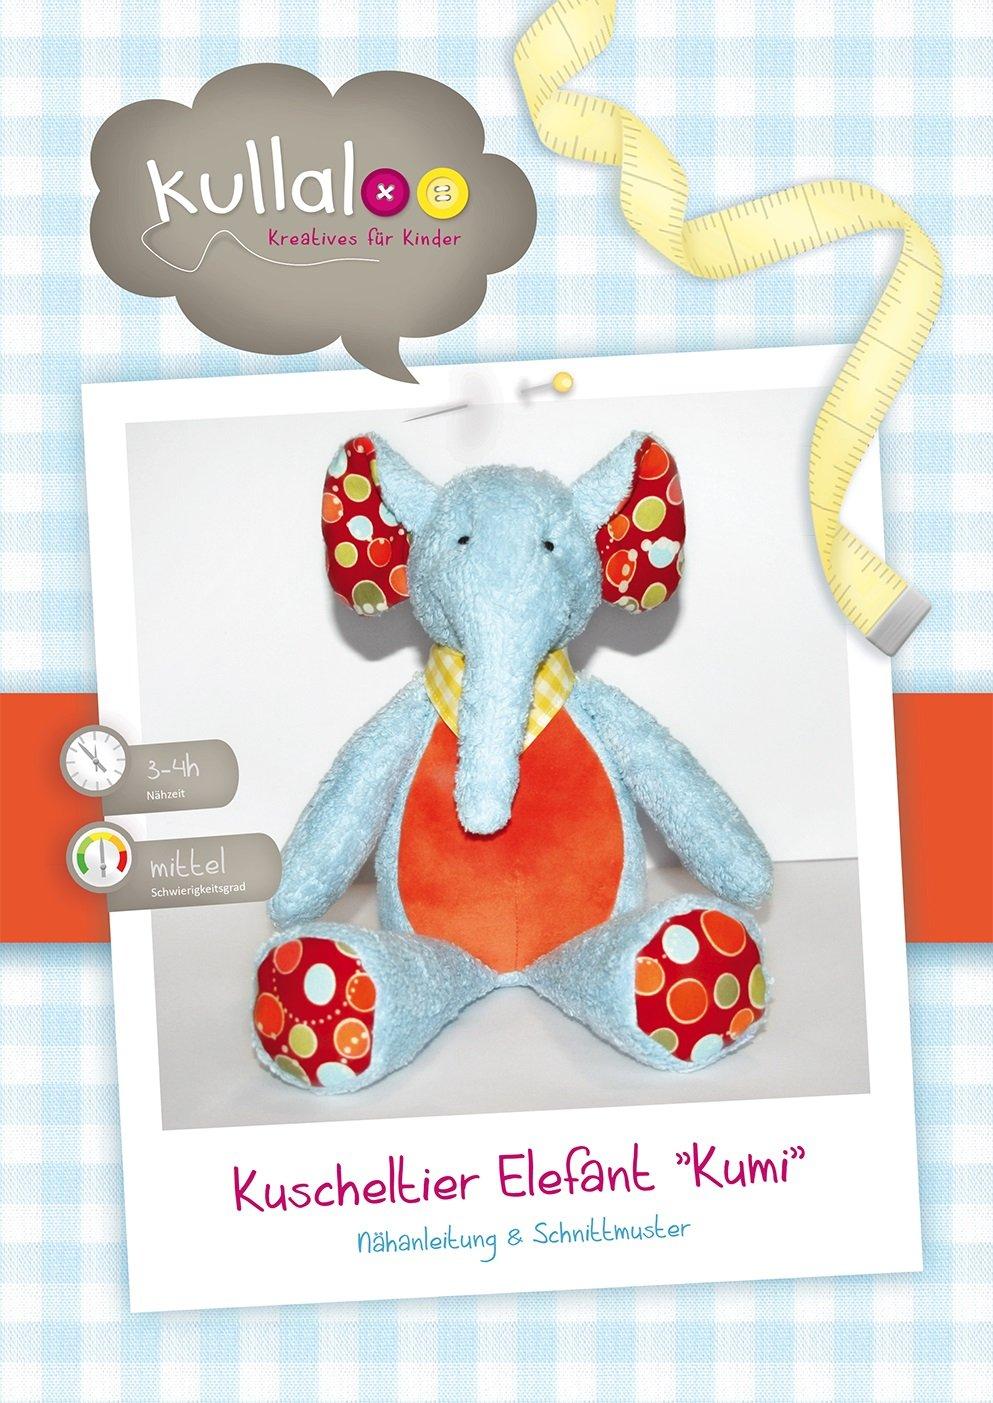 kullaloo - Schnittmuster & Nähanleitung für Kuscheltier Elefant ...